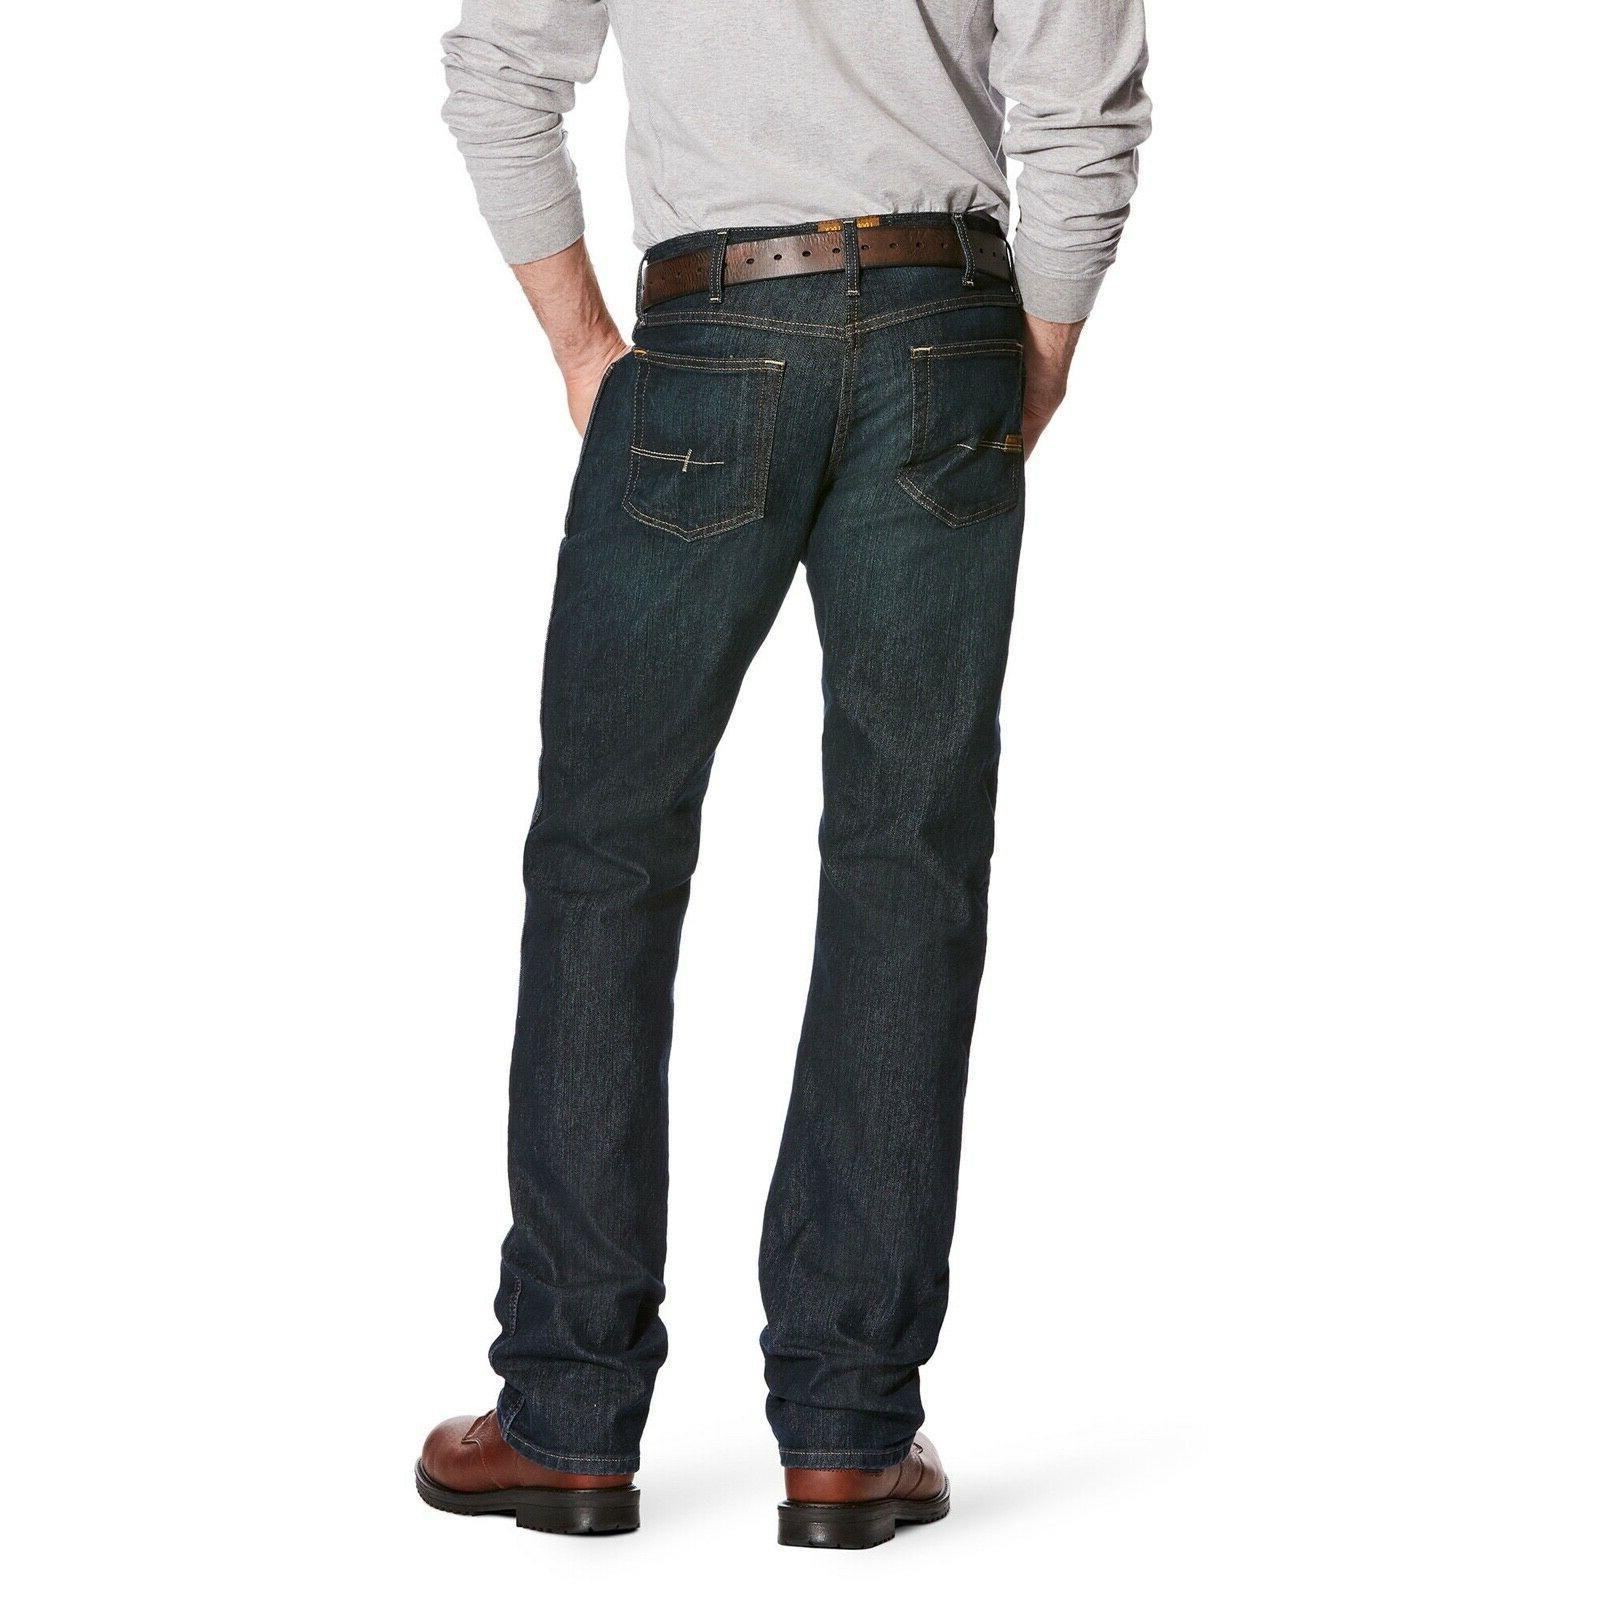 Ariat® Men's Rebar DuraStretch Slim Fit Leg 10016223